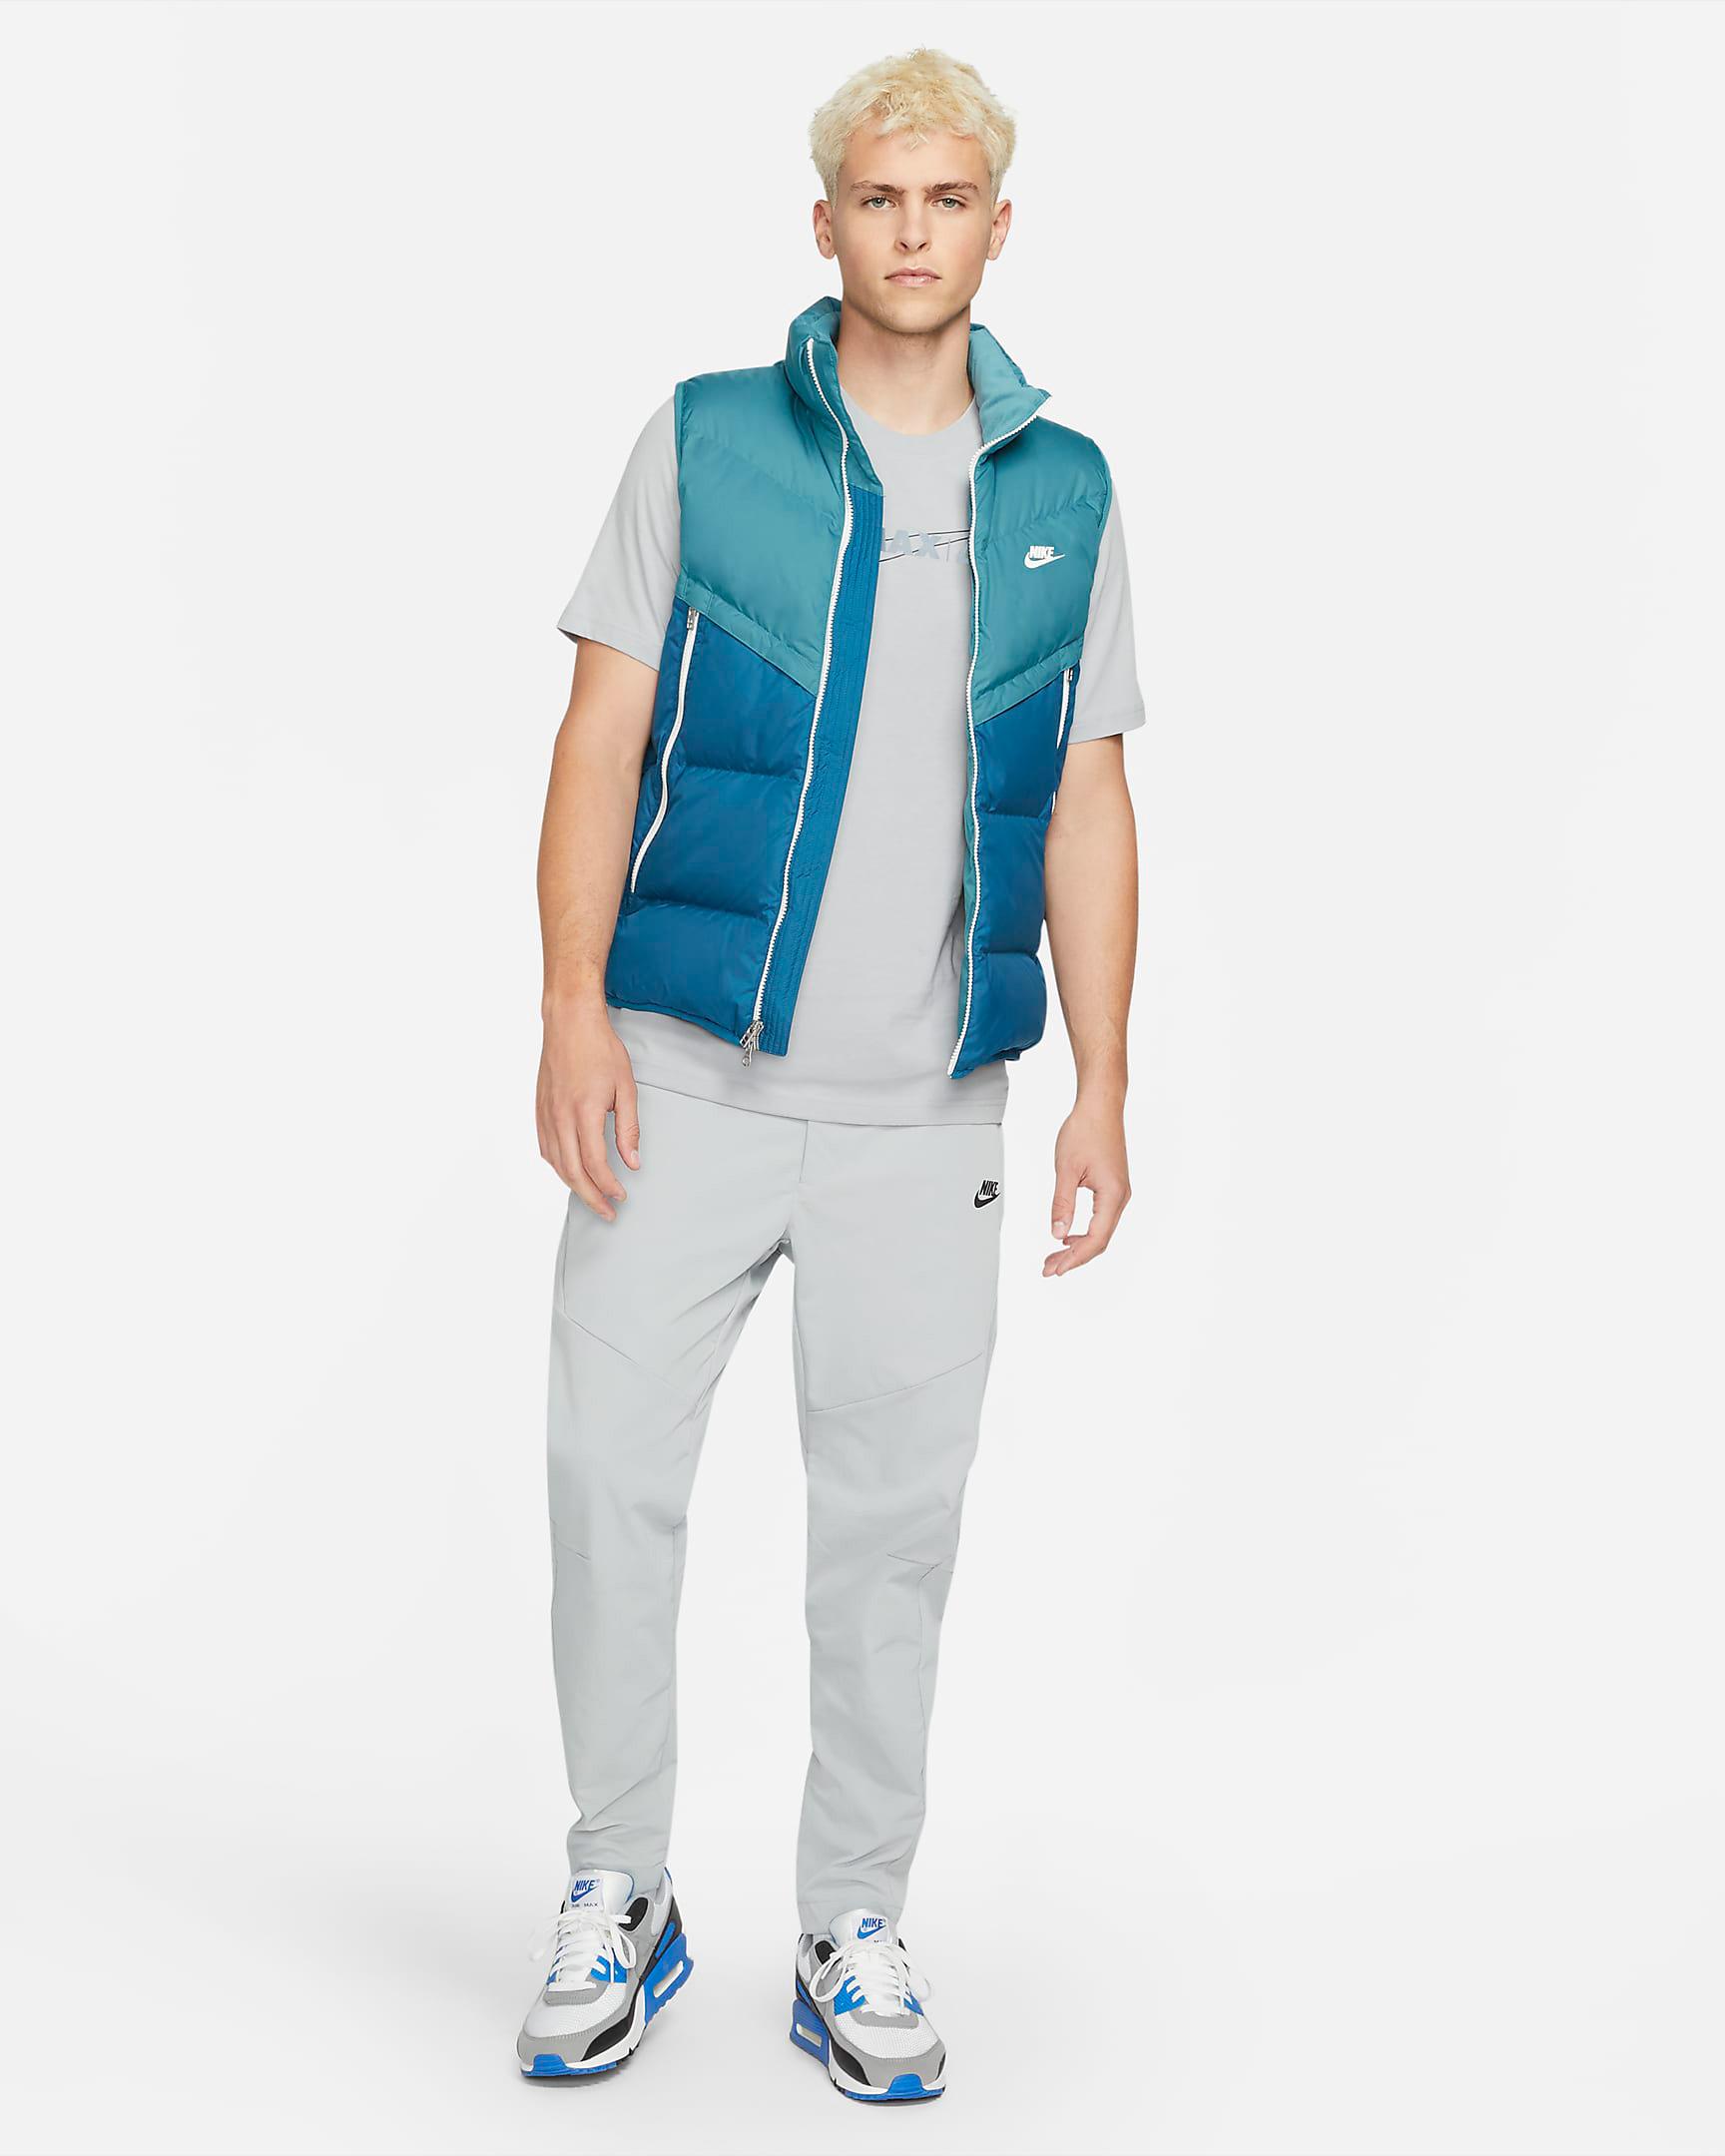 nike-rift-blue-windrunner-vest-jacket-outfit